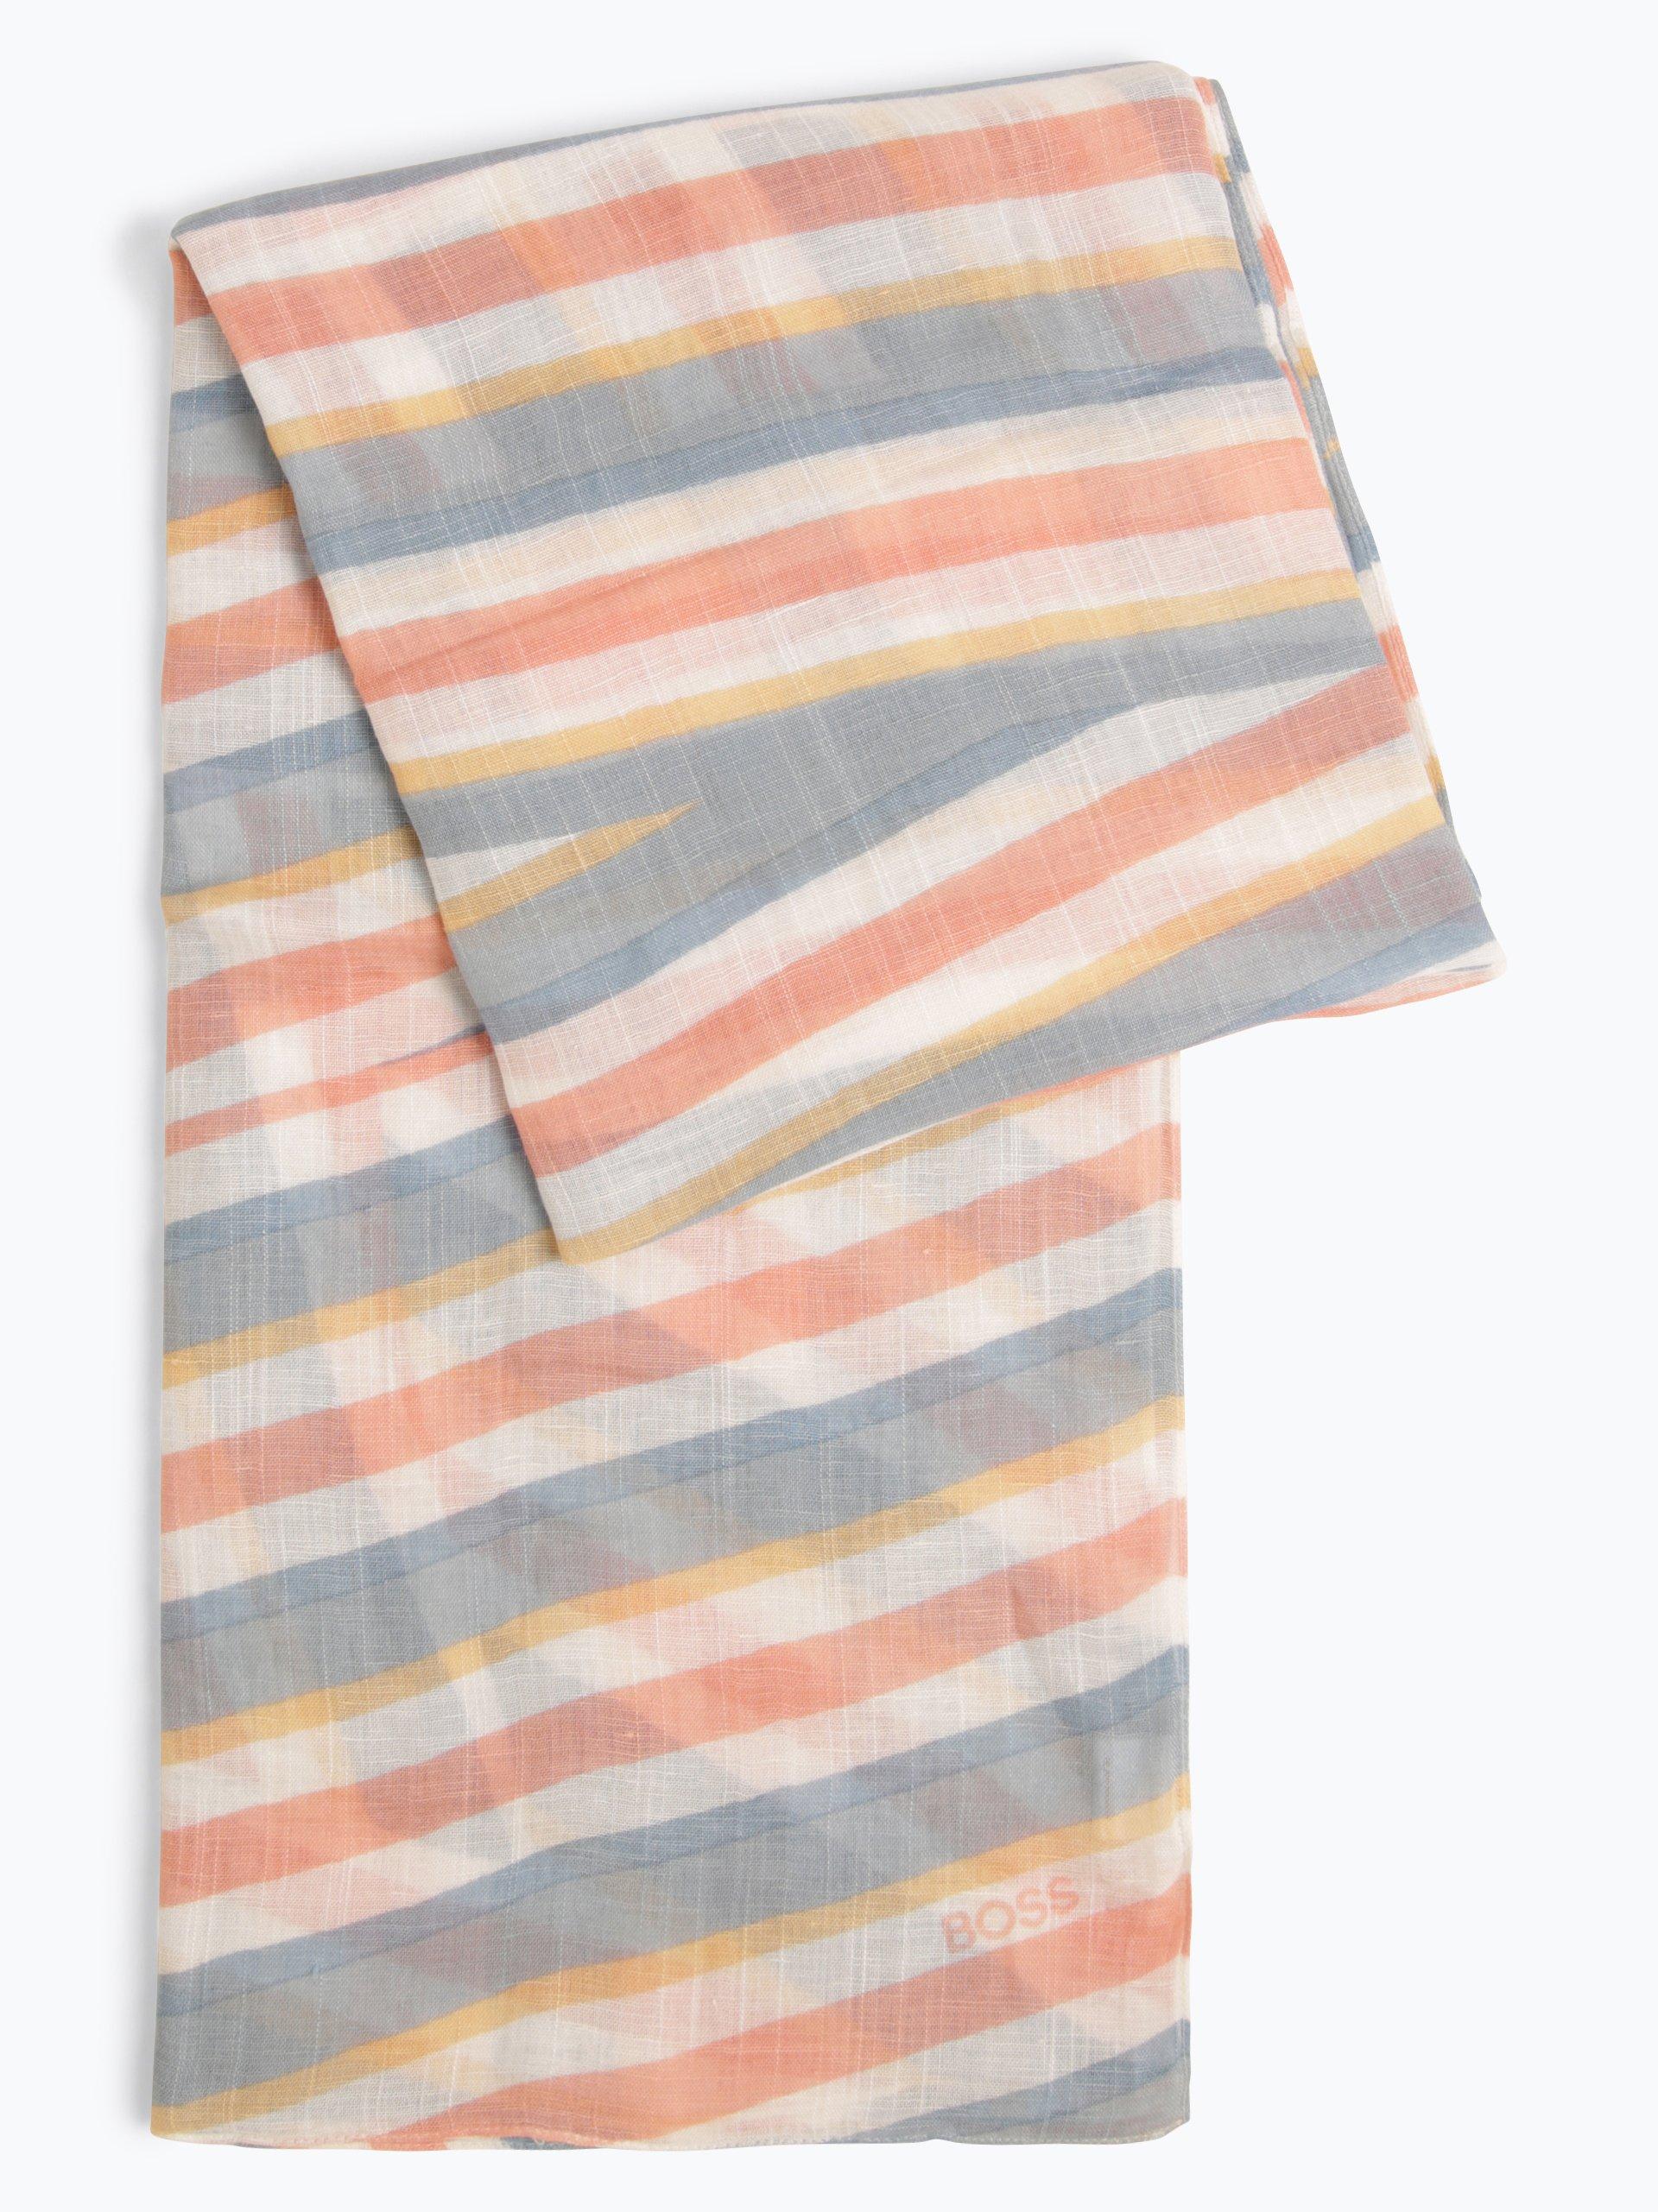 BOSS Casual Damen Schal mit Leinen-Anteil - Nawa